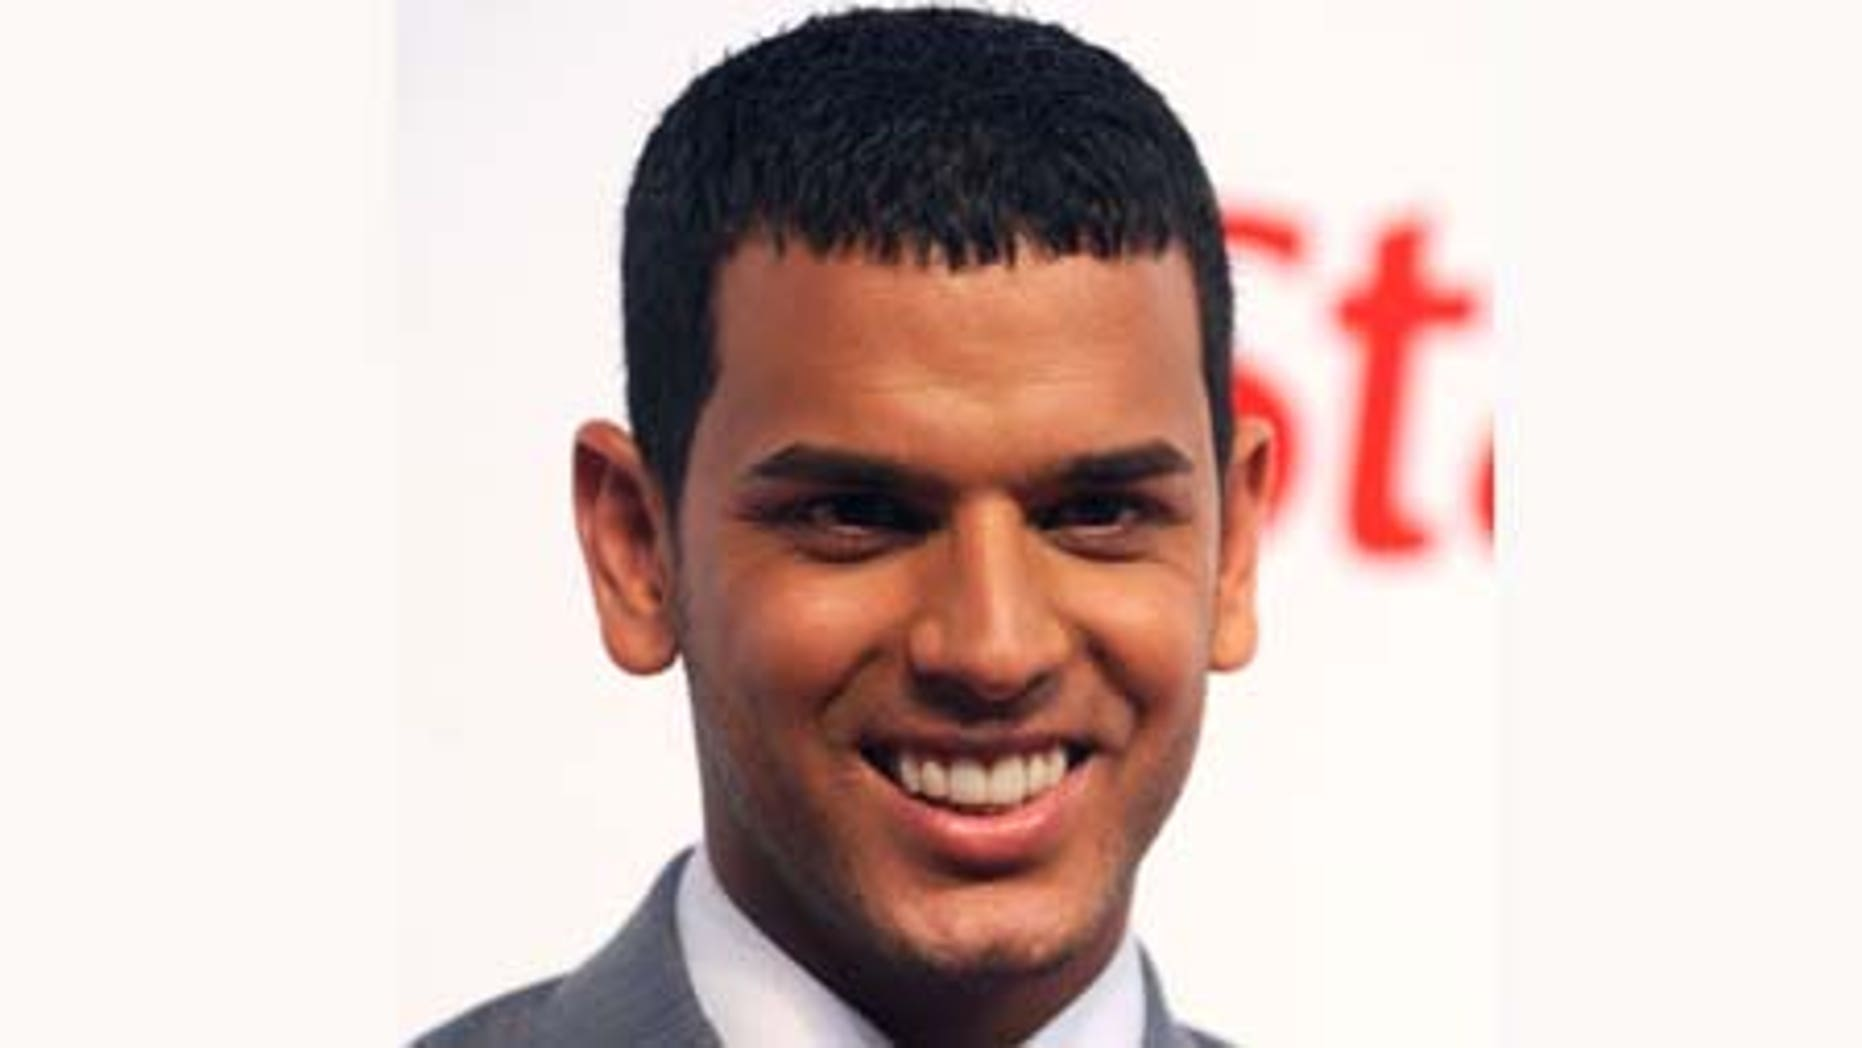 attends the 2010 Billboard Latin Music Awards at Coliseo de Puerto Rico José Miguel Agrelot on April 29, 2010 in San Juan, Puerto Rico.